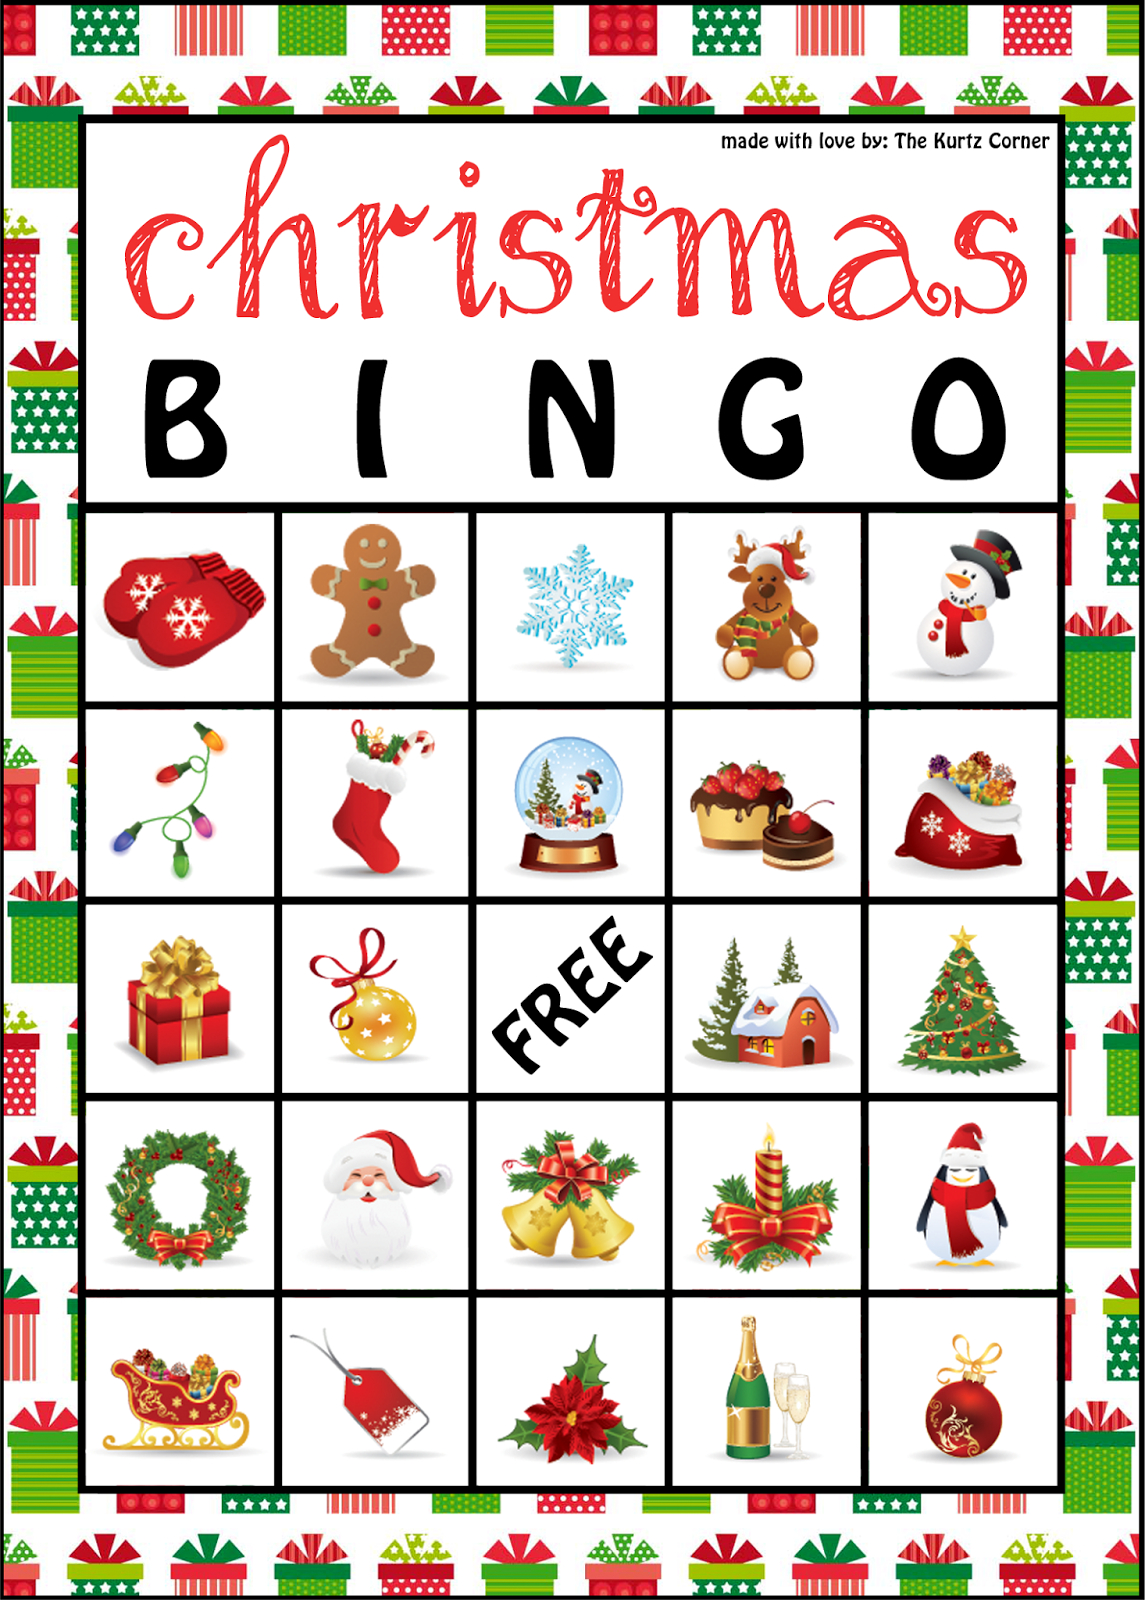 Free Printable Christmas Bingo Cards From The Kurtz Corner | Bingo - Free Christmas Bingo Game Printable